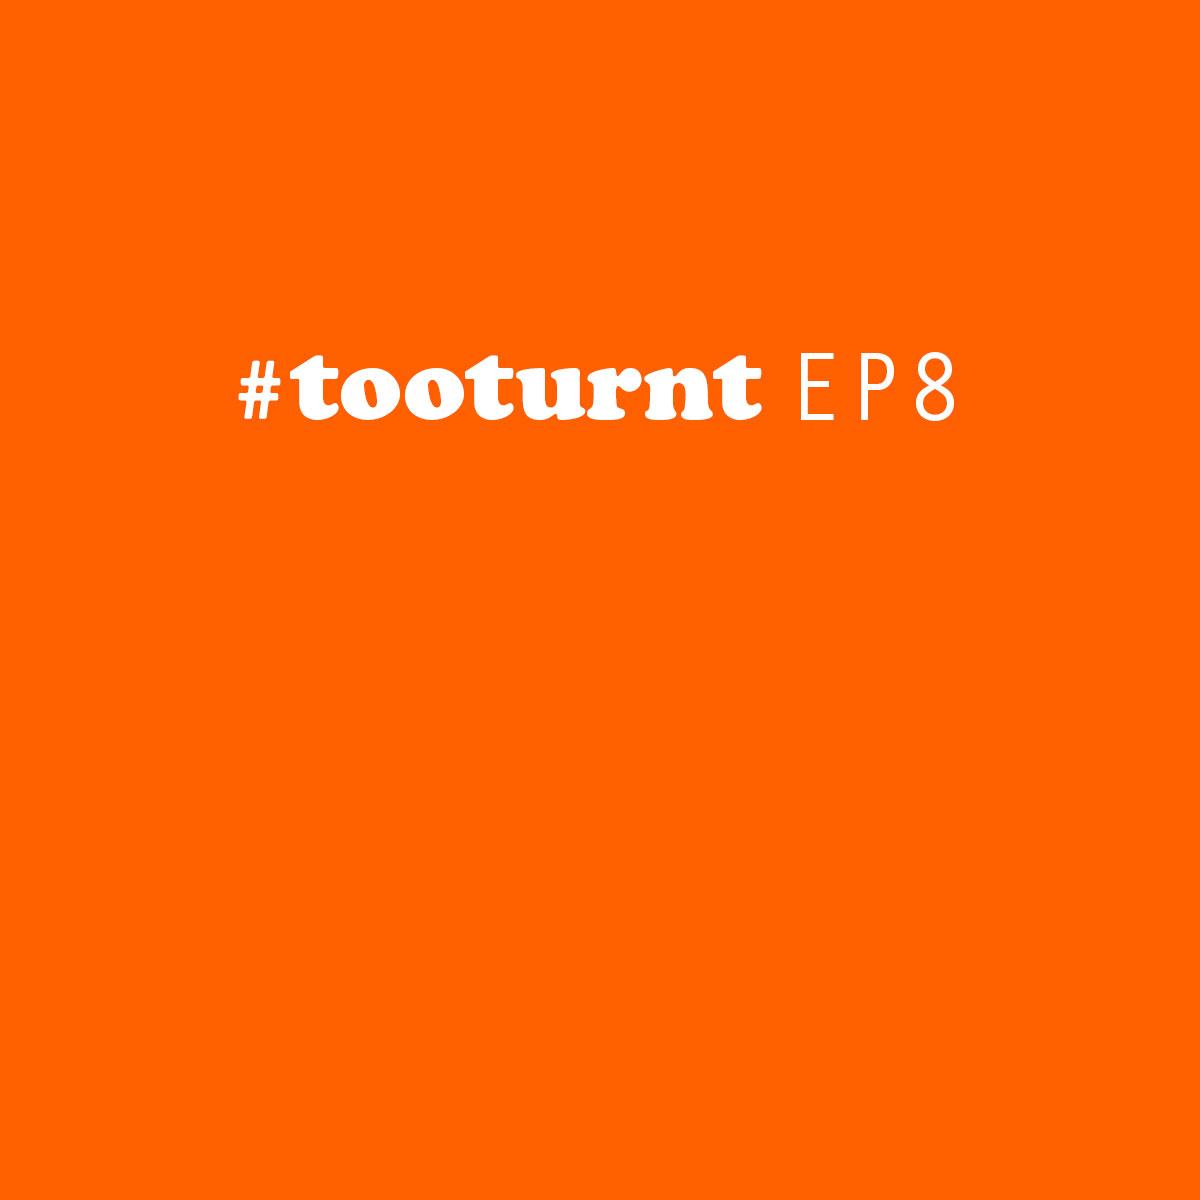 Youth Radio Raw: Too Turnt Radio Episode 8